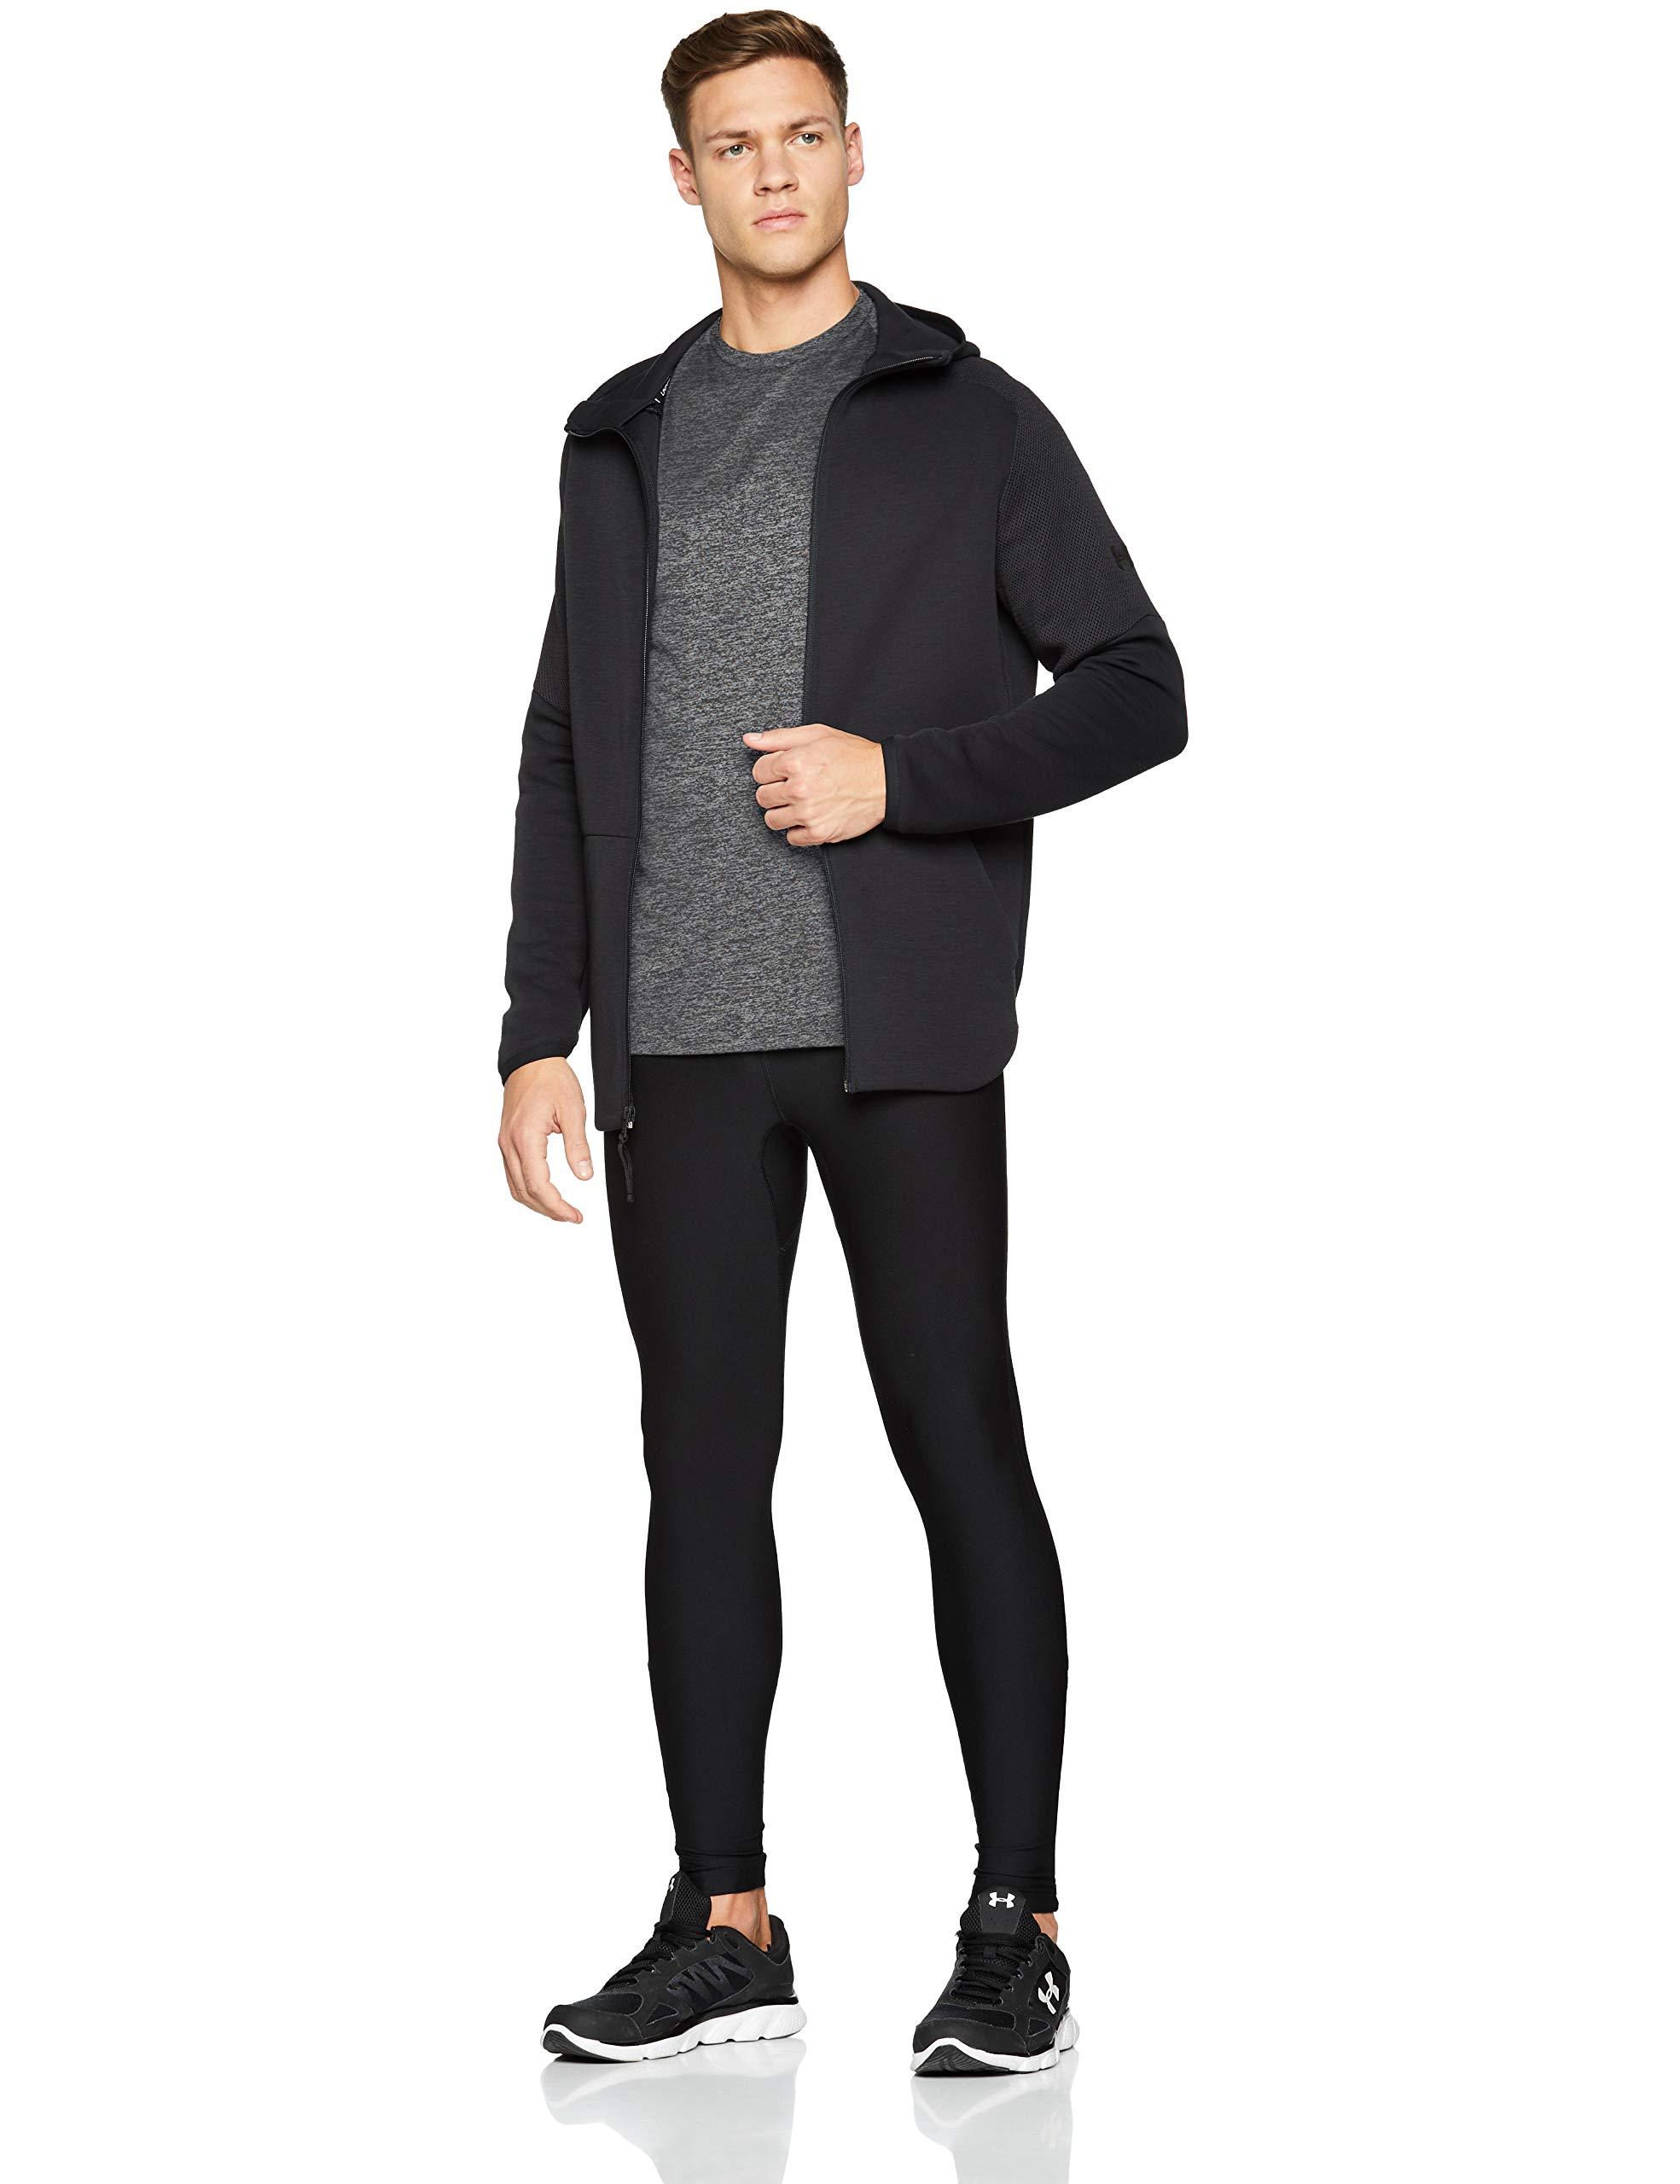 Under Armour Men's Tech 2.0 Short Sleeve T-Shirt, Black (002)/Black, 3X-Large by Under Armour (Image #7)